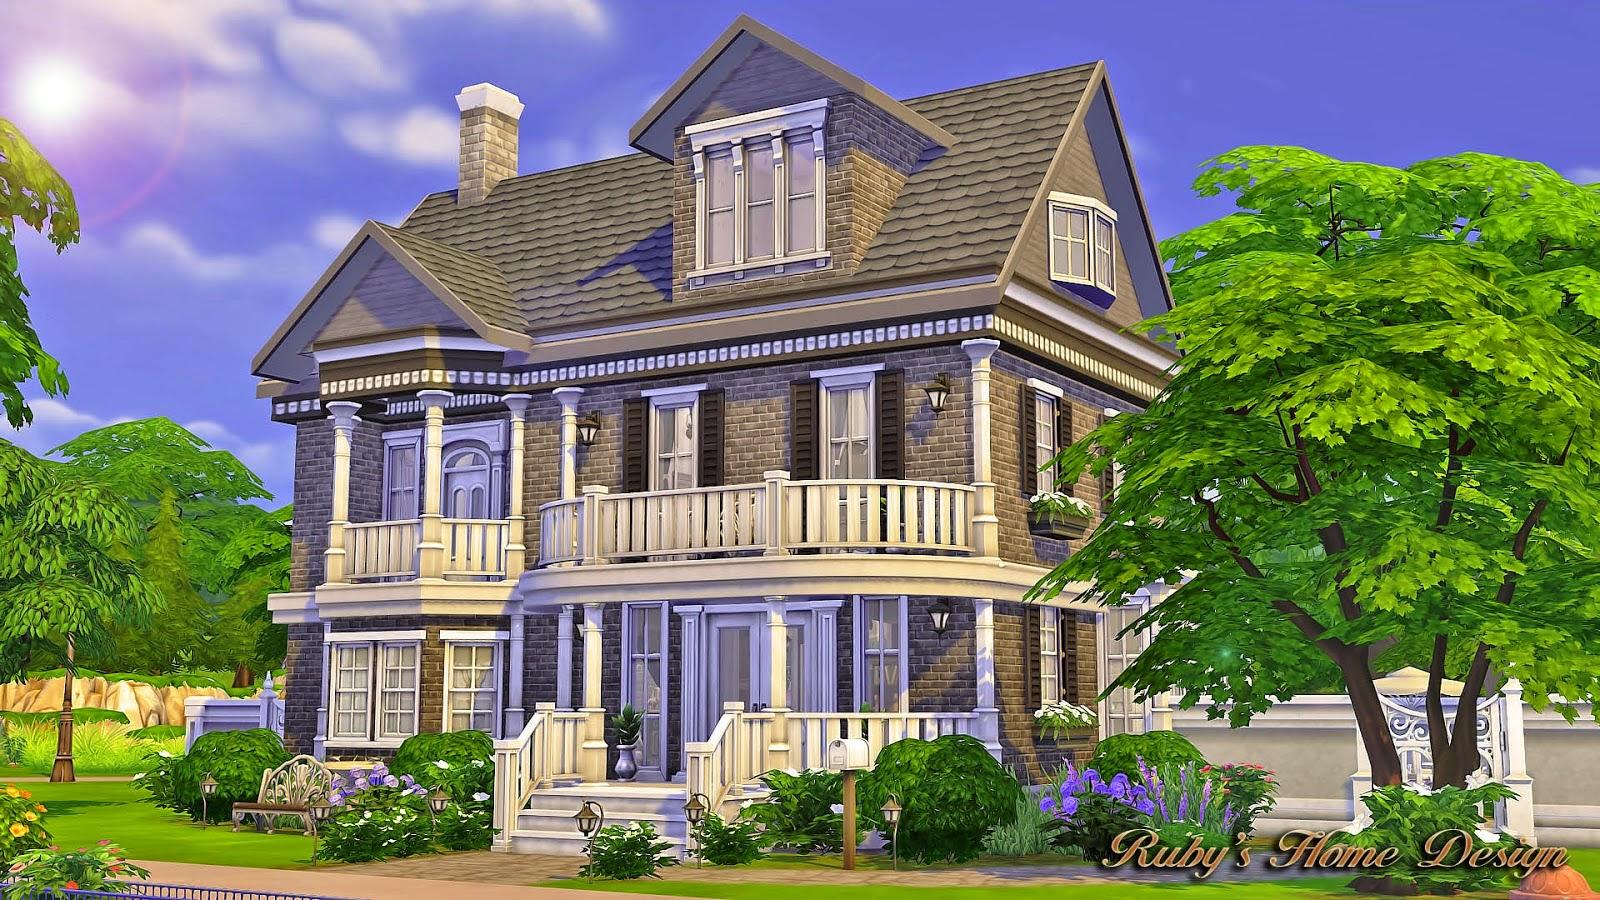 05jpg - Sims 4 Home Design 2